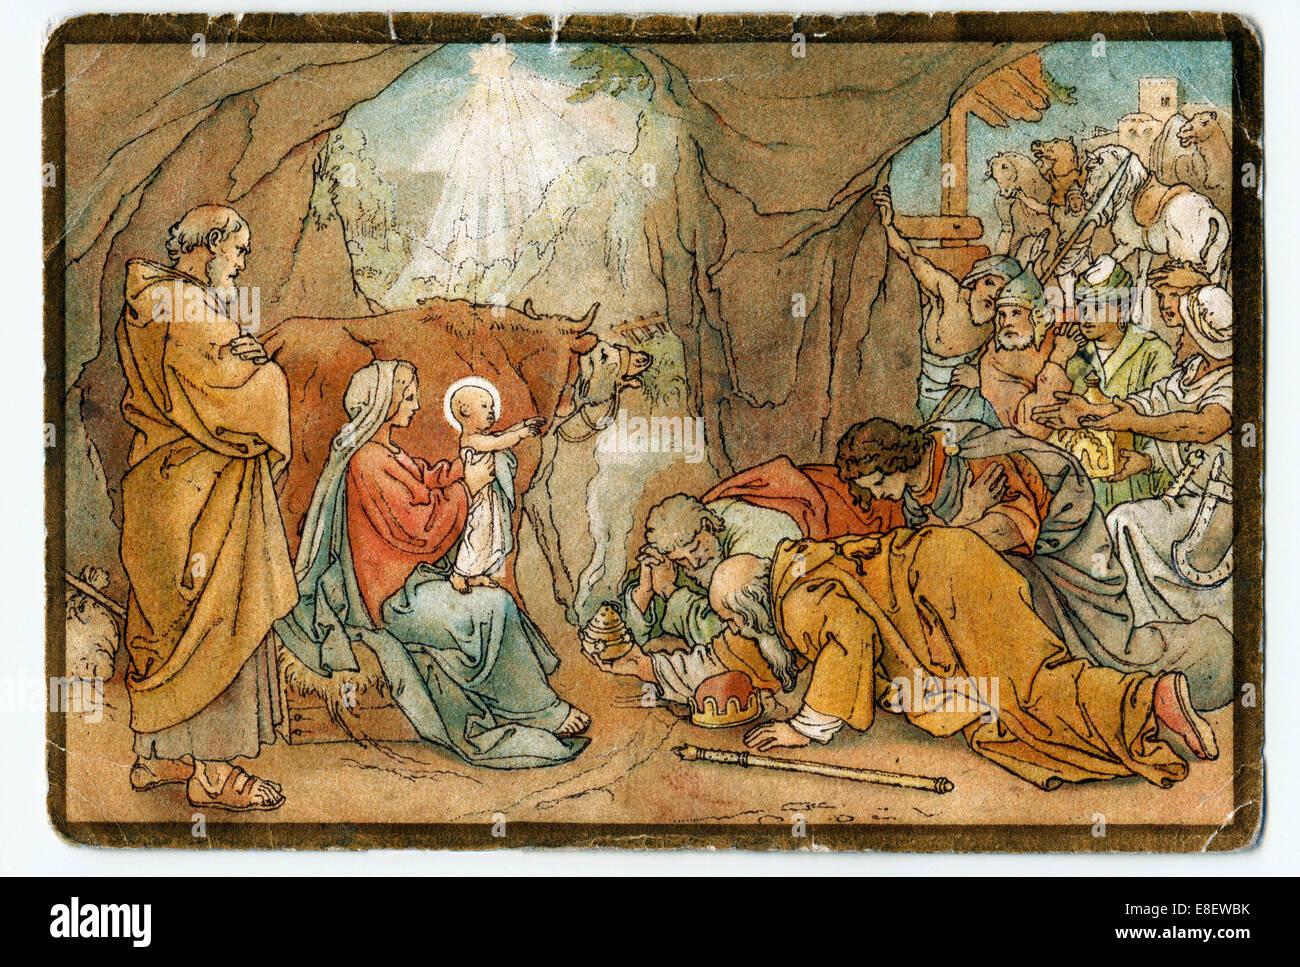 The Three Magi Kneeling Before The Baby Jesus Adoration